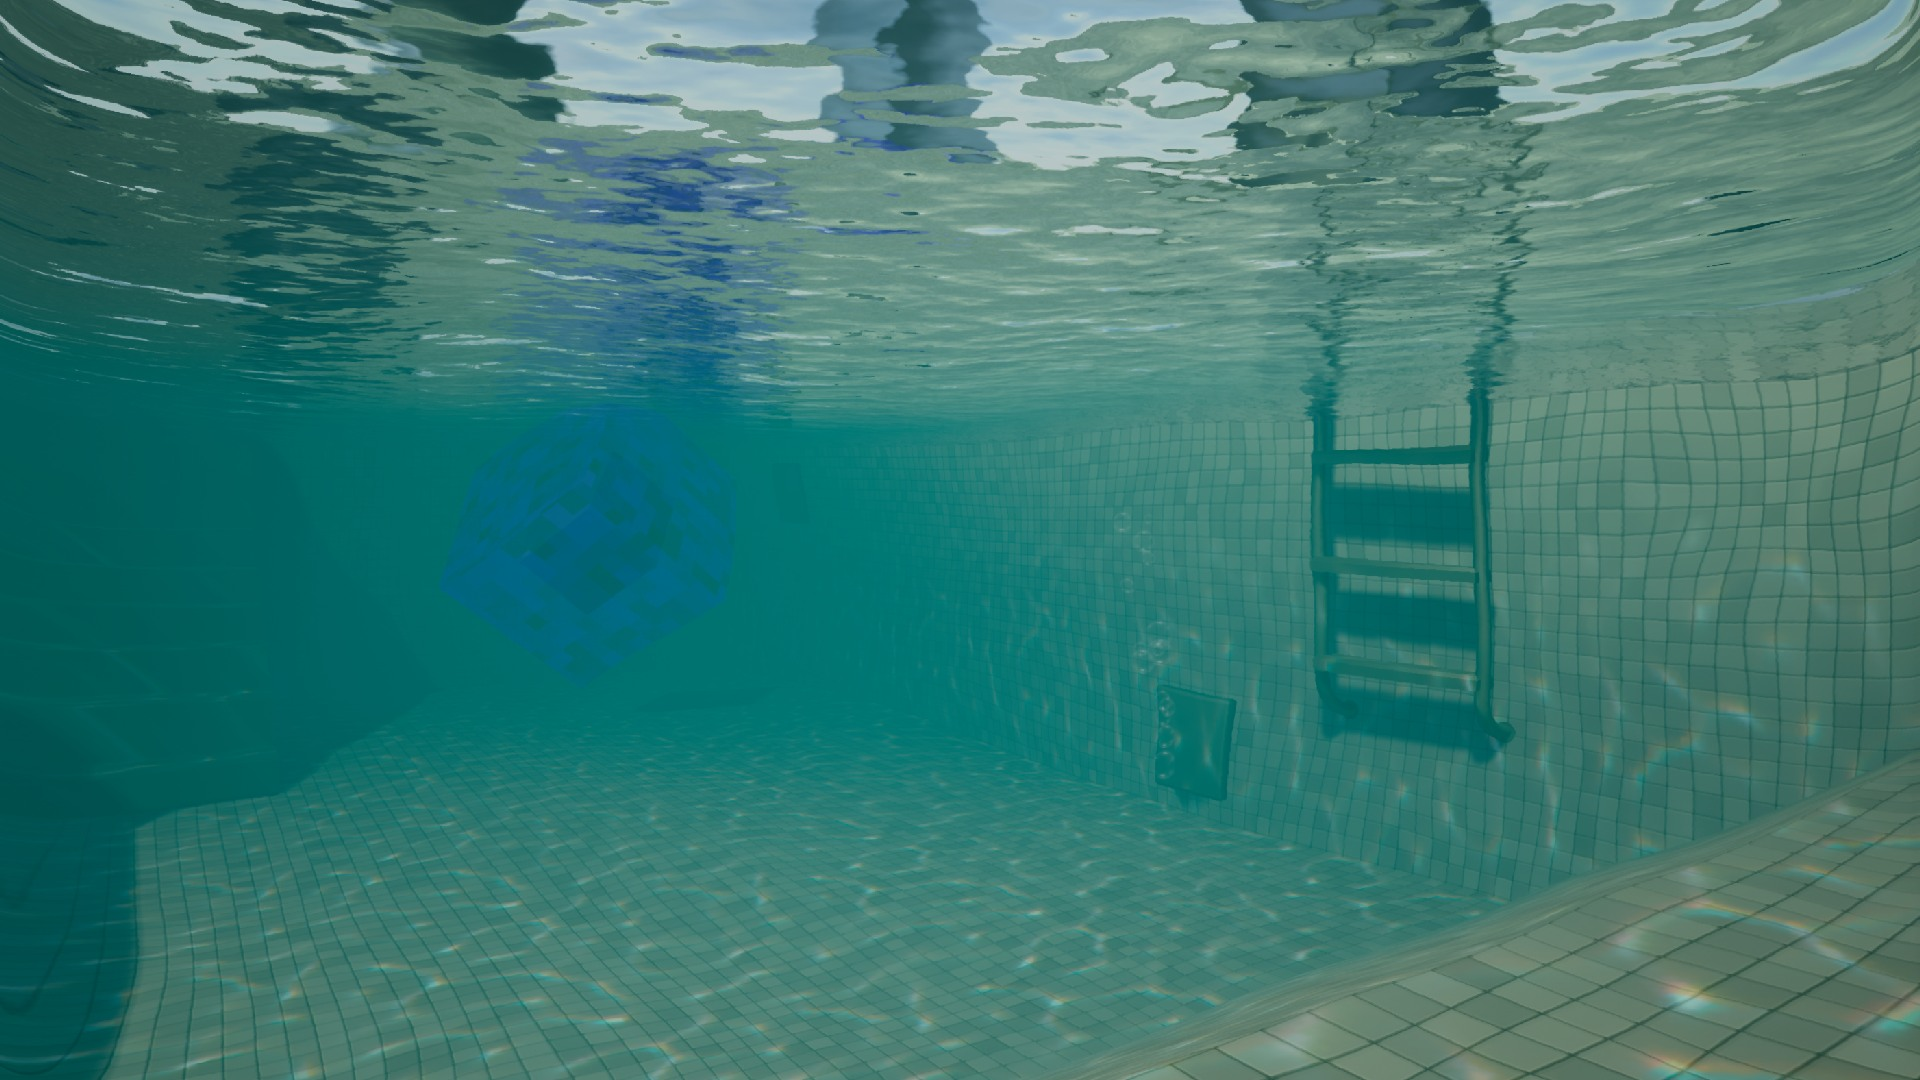 Aquatic Surface – Imaginary Blend